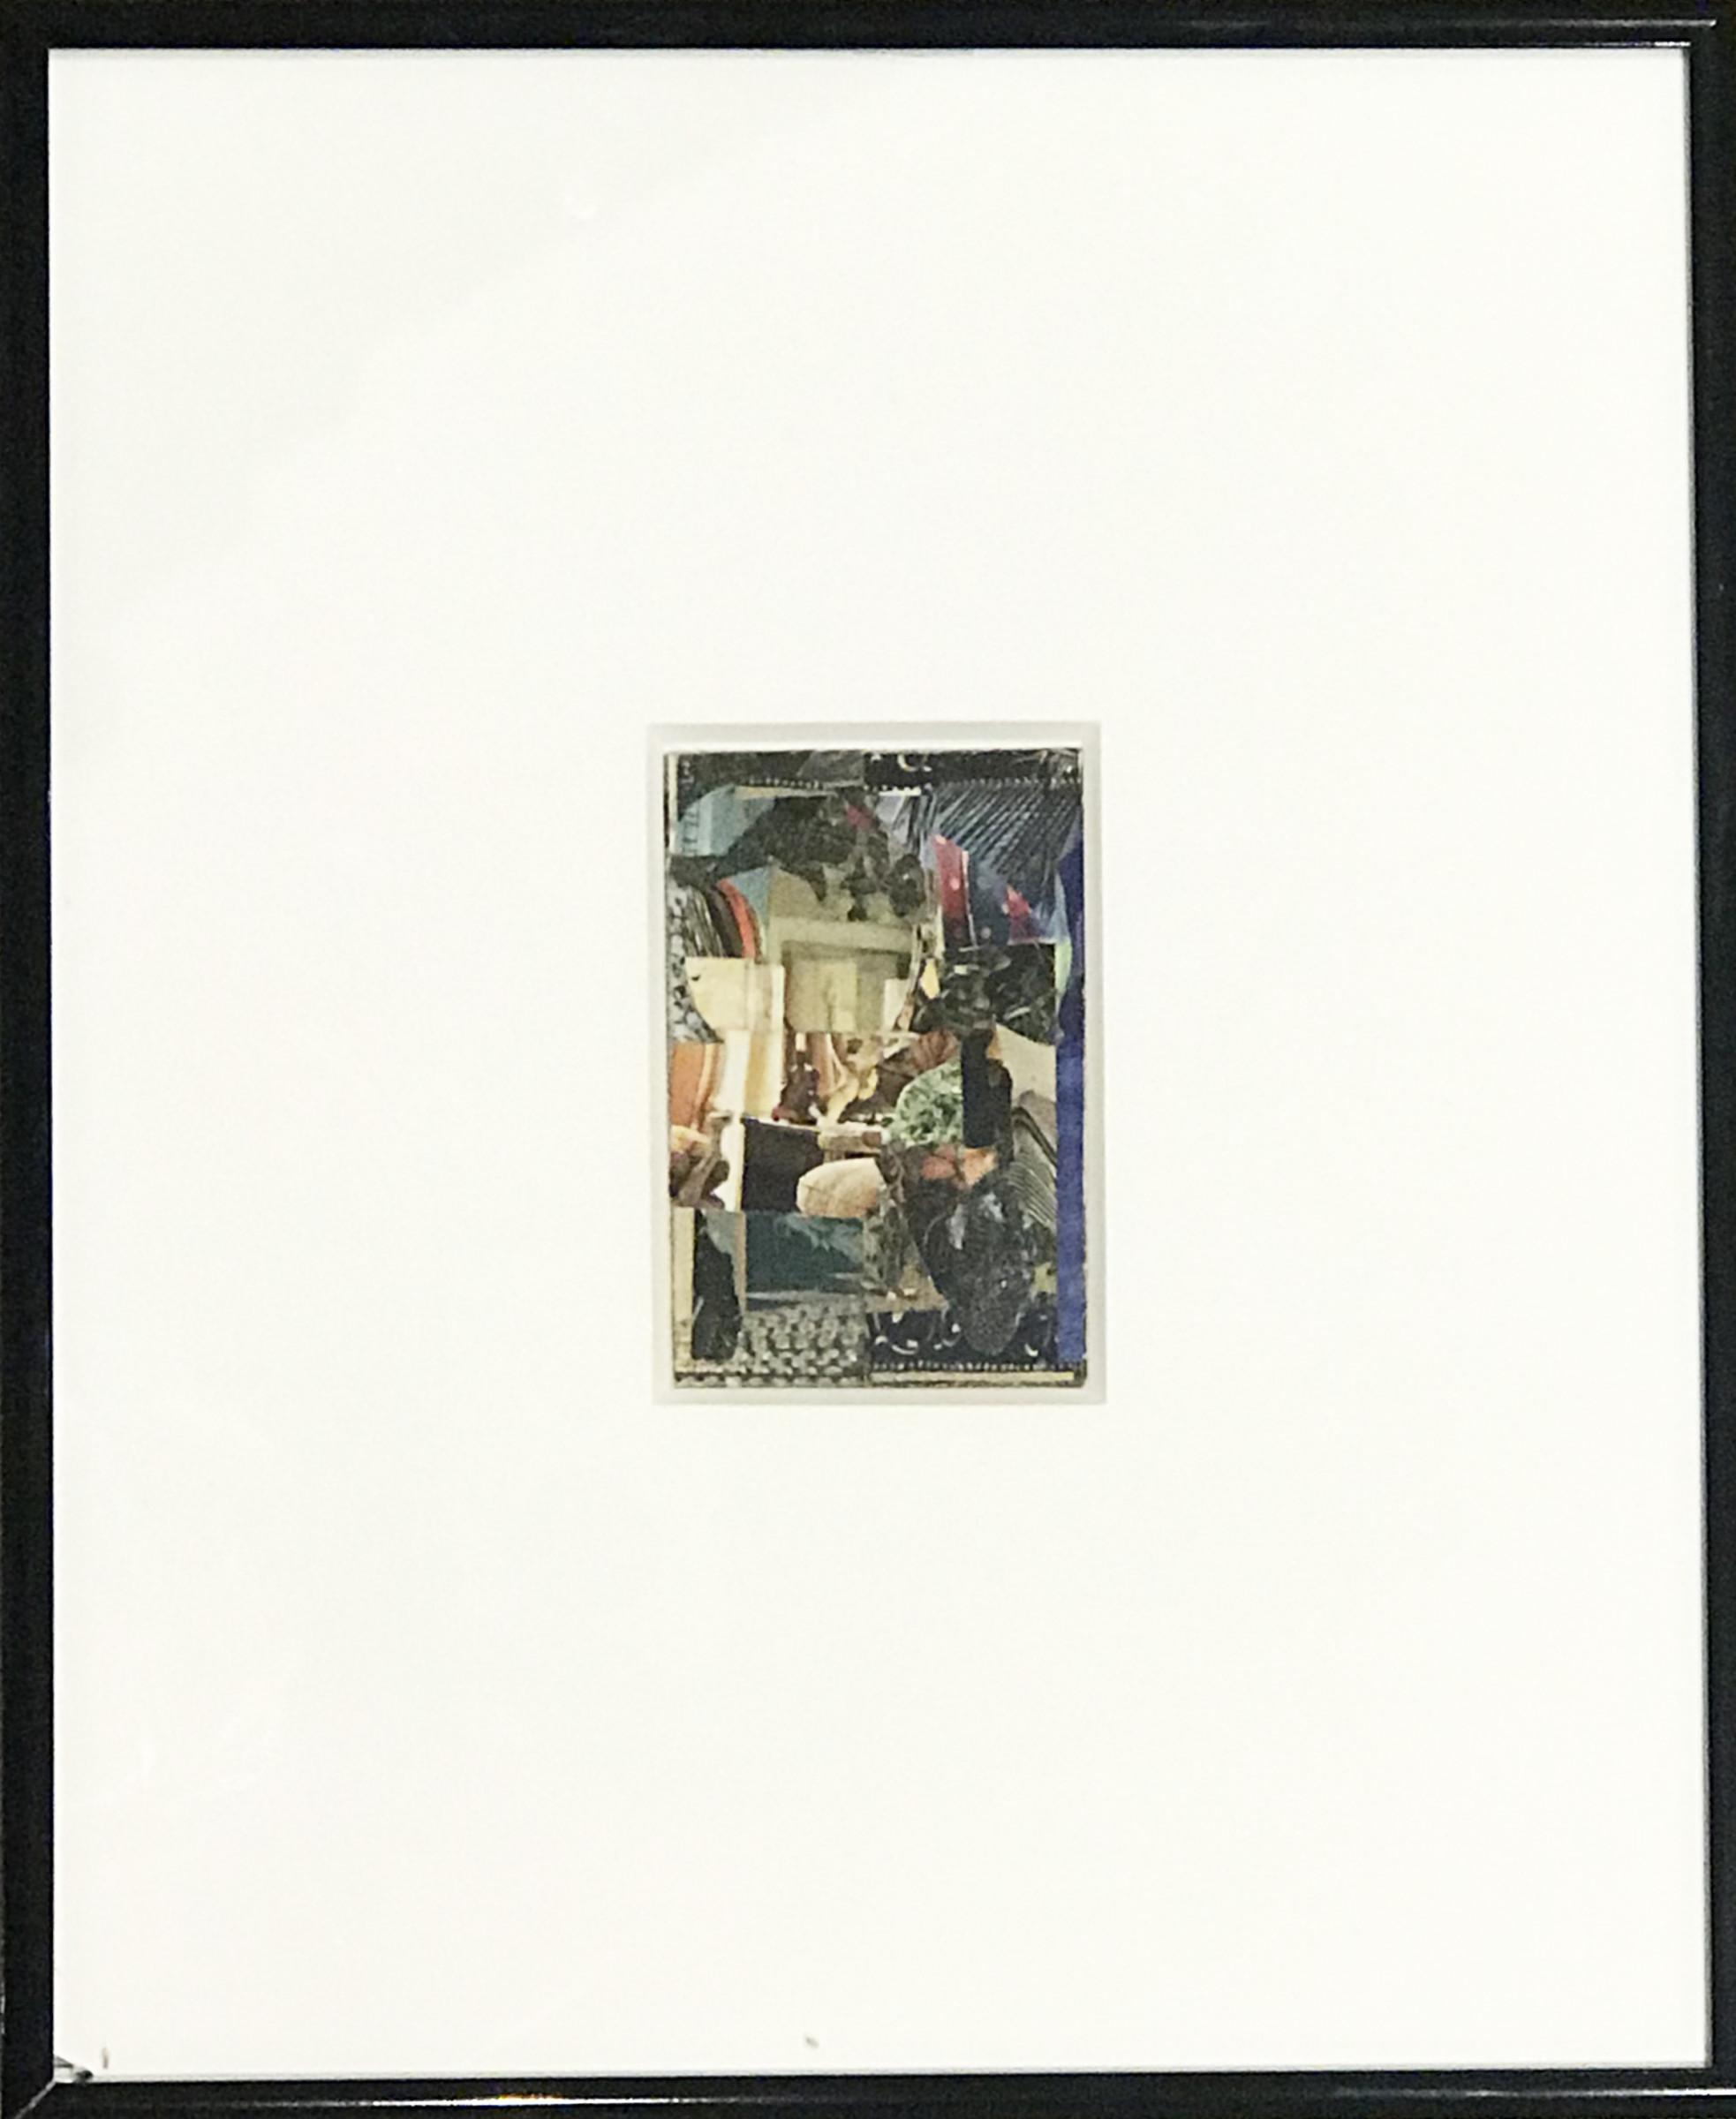 <span class=&#34;link fancybox-details-link&#34;><a href=&#34;/artworks/308-jesse-lott-untitled/&#34;>View Detail Page</a></span><div class=&#34;artist&#34;><strong>Jesse Lott</strong></div> <div class=&#34;title&#34;>Untitled</div> <div class=&#34;medium&#34;>Mixed Media</div> <div class=&#34;dimensions&#34;>3 1/2 x 2 1/2 in<br /> 8.9 x 6.3 cm</div>